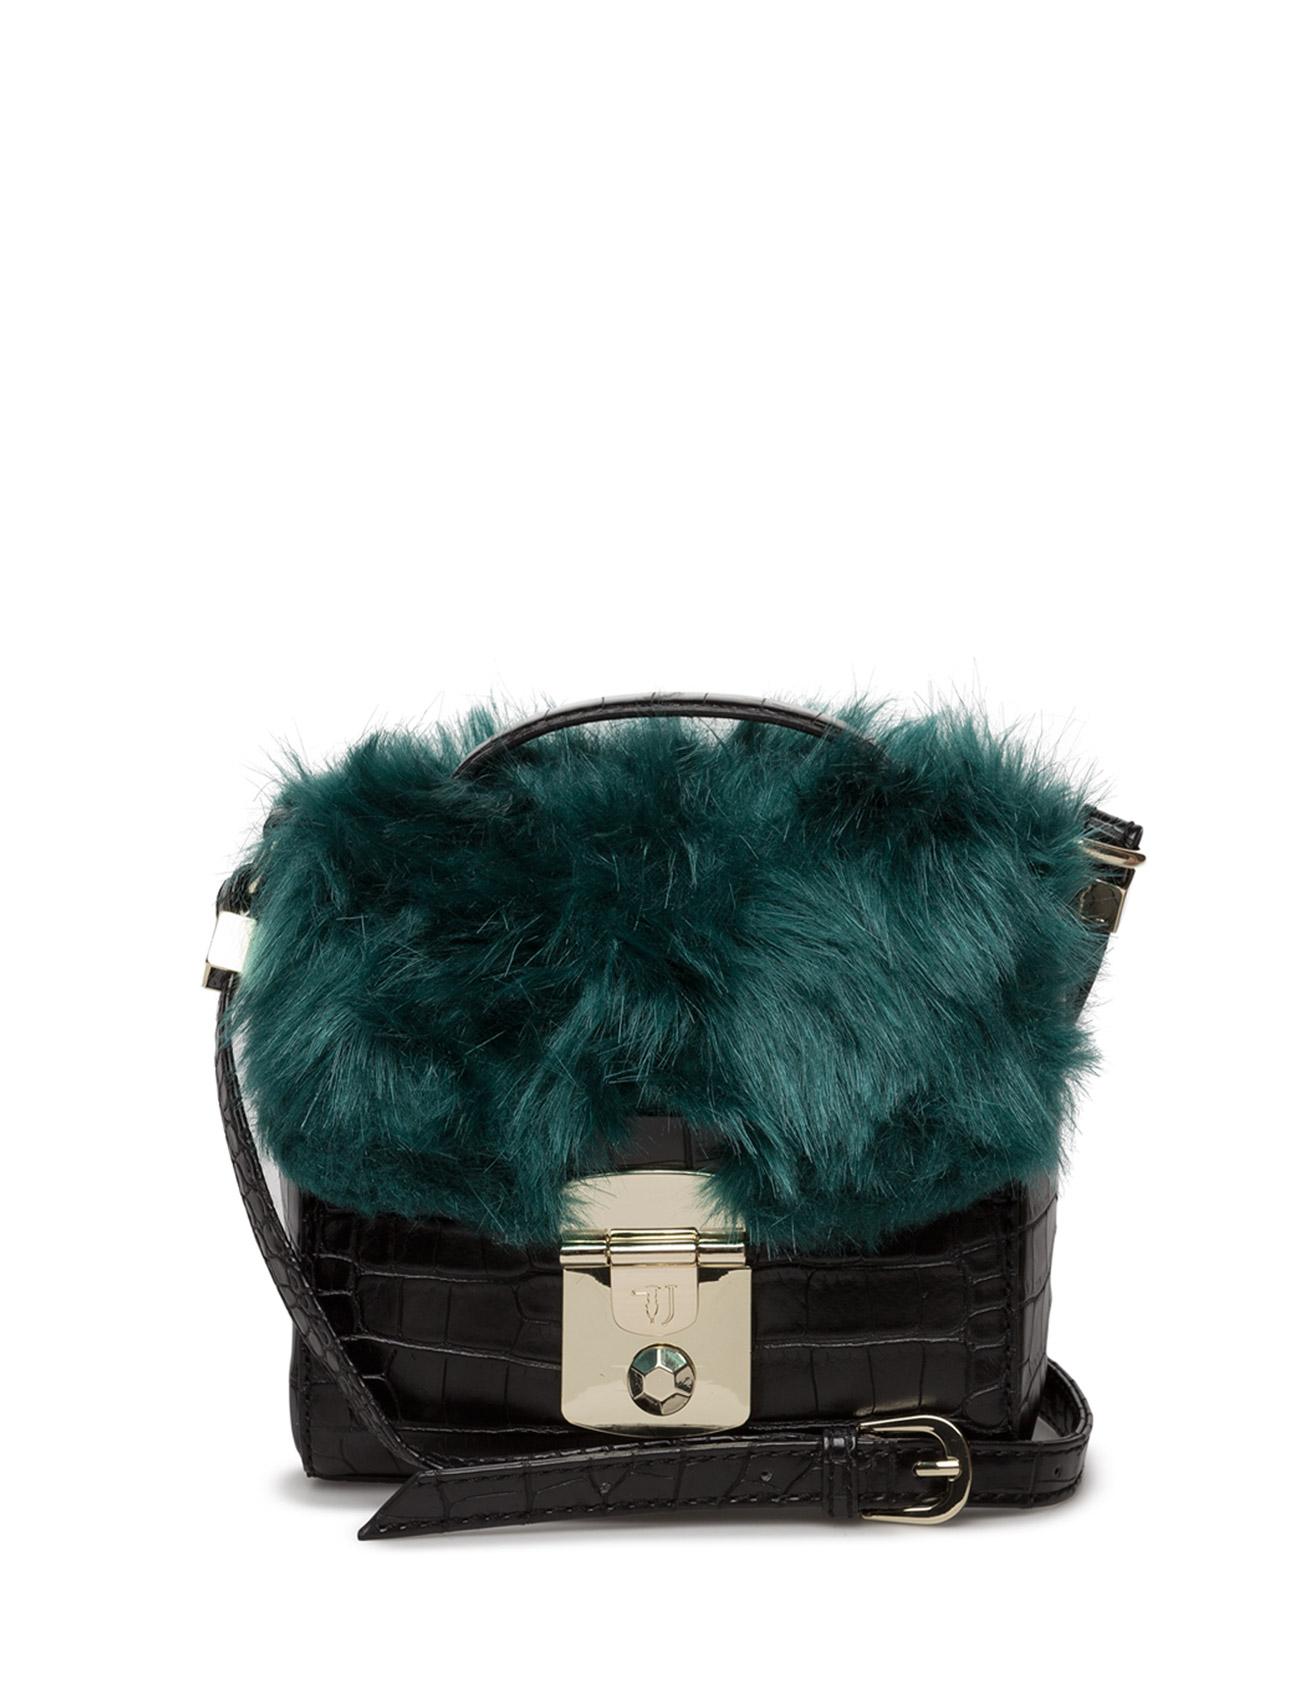 Levanto - Mini Bag TRUSSARDI Små tasker til Kvinder i Grøn